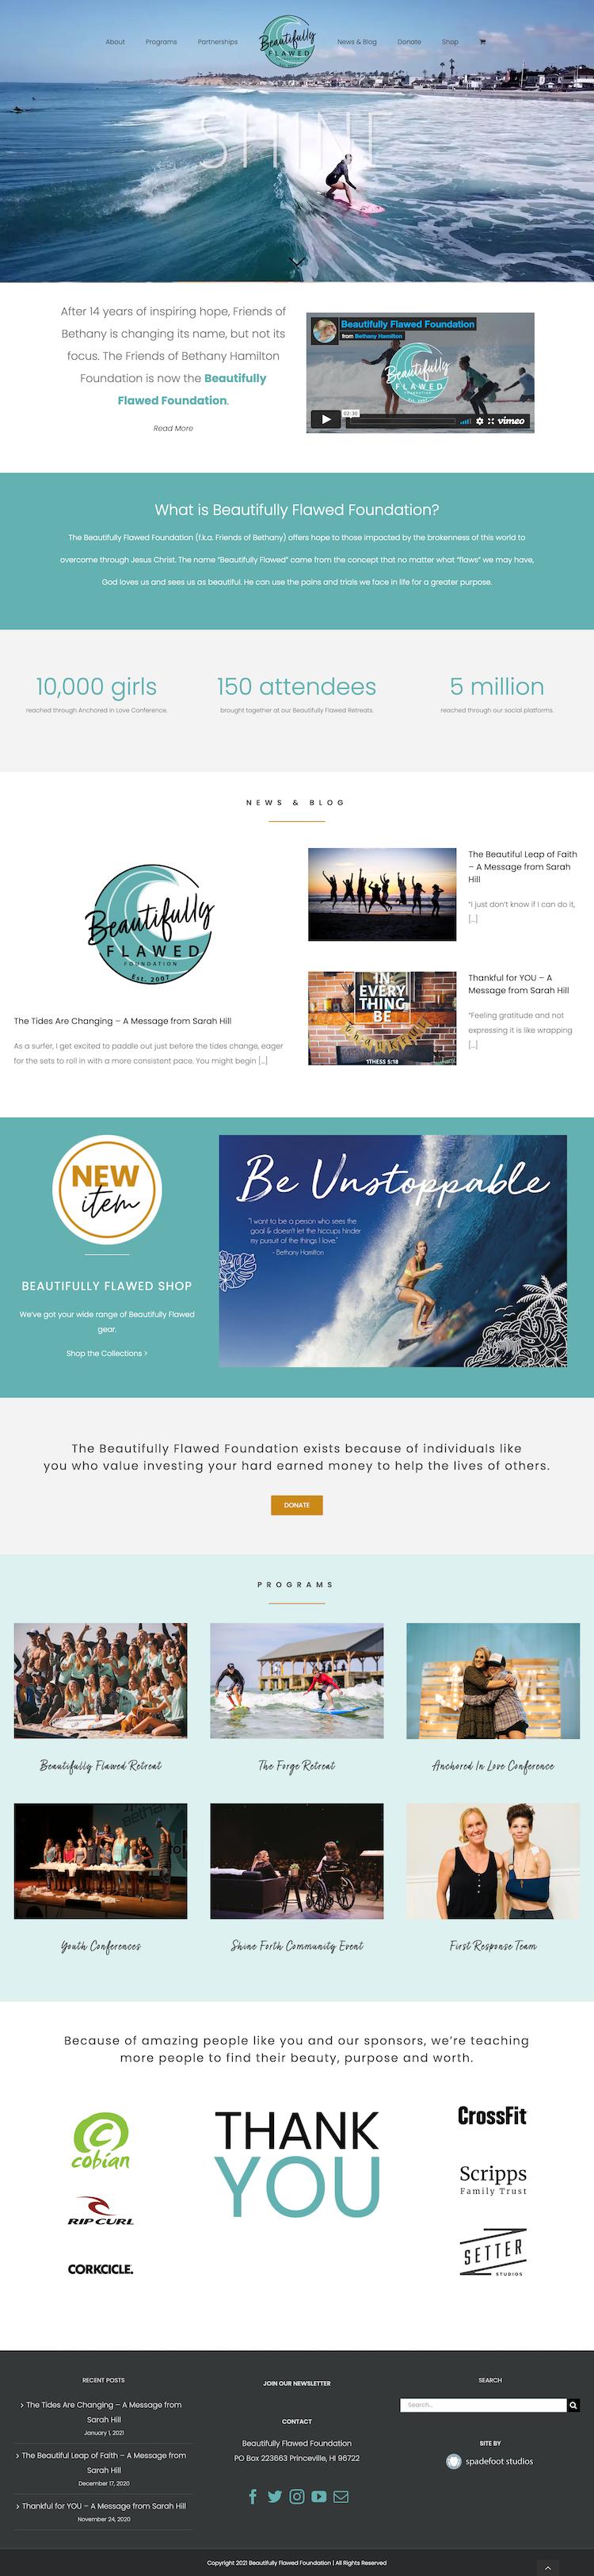 Beautifully Flawed Homepage Screenshot